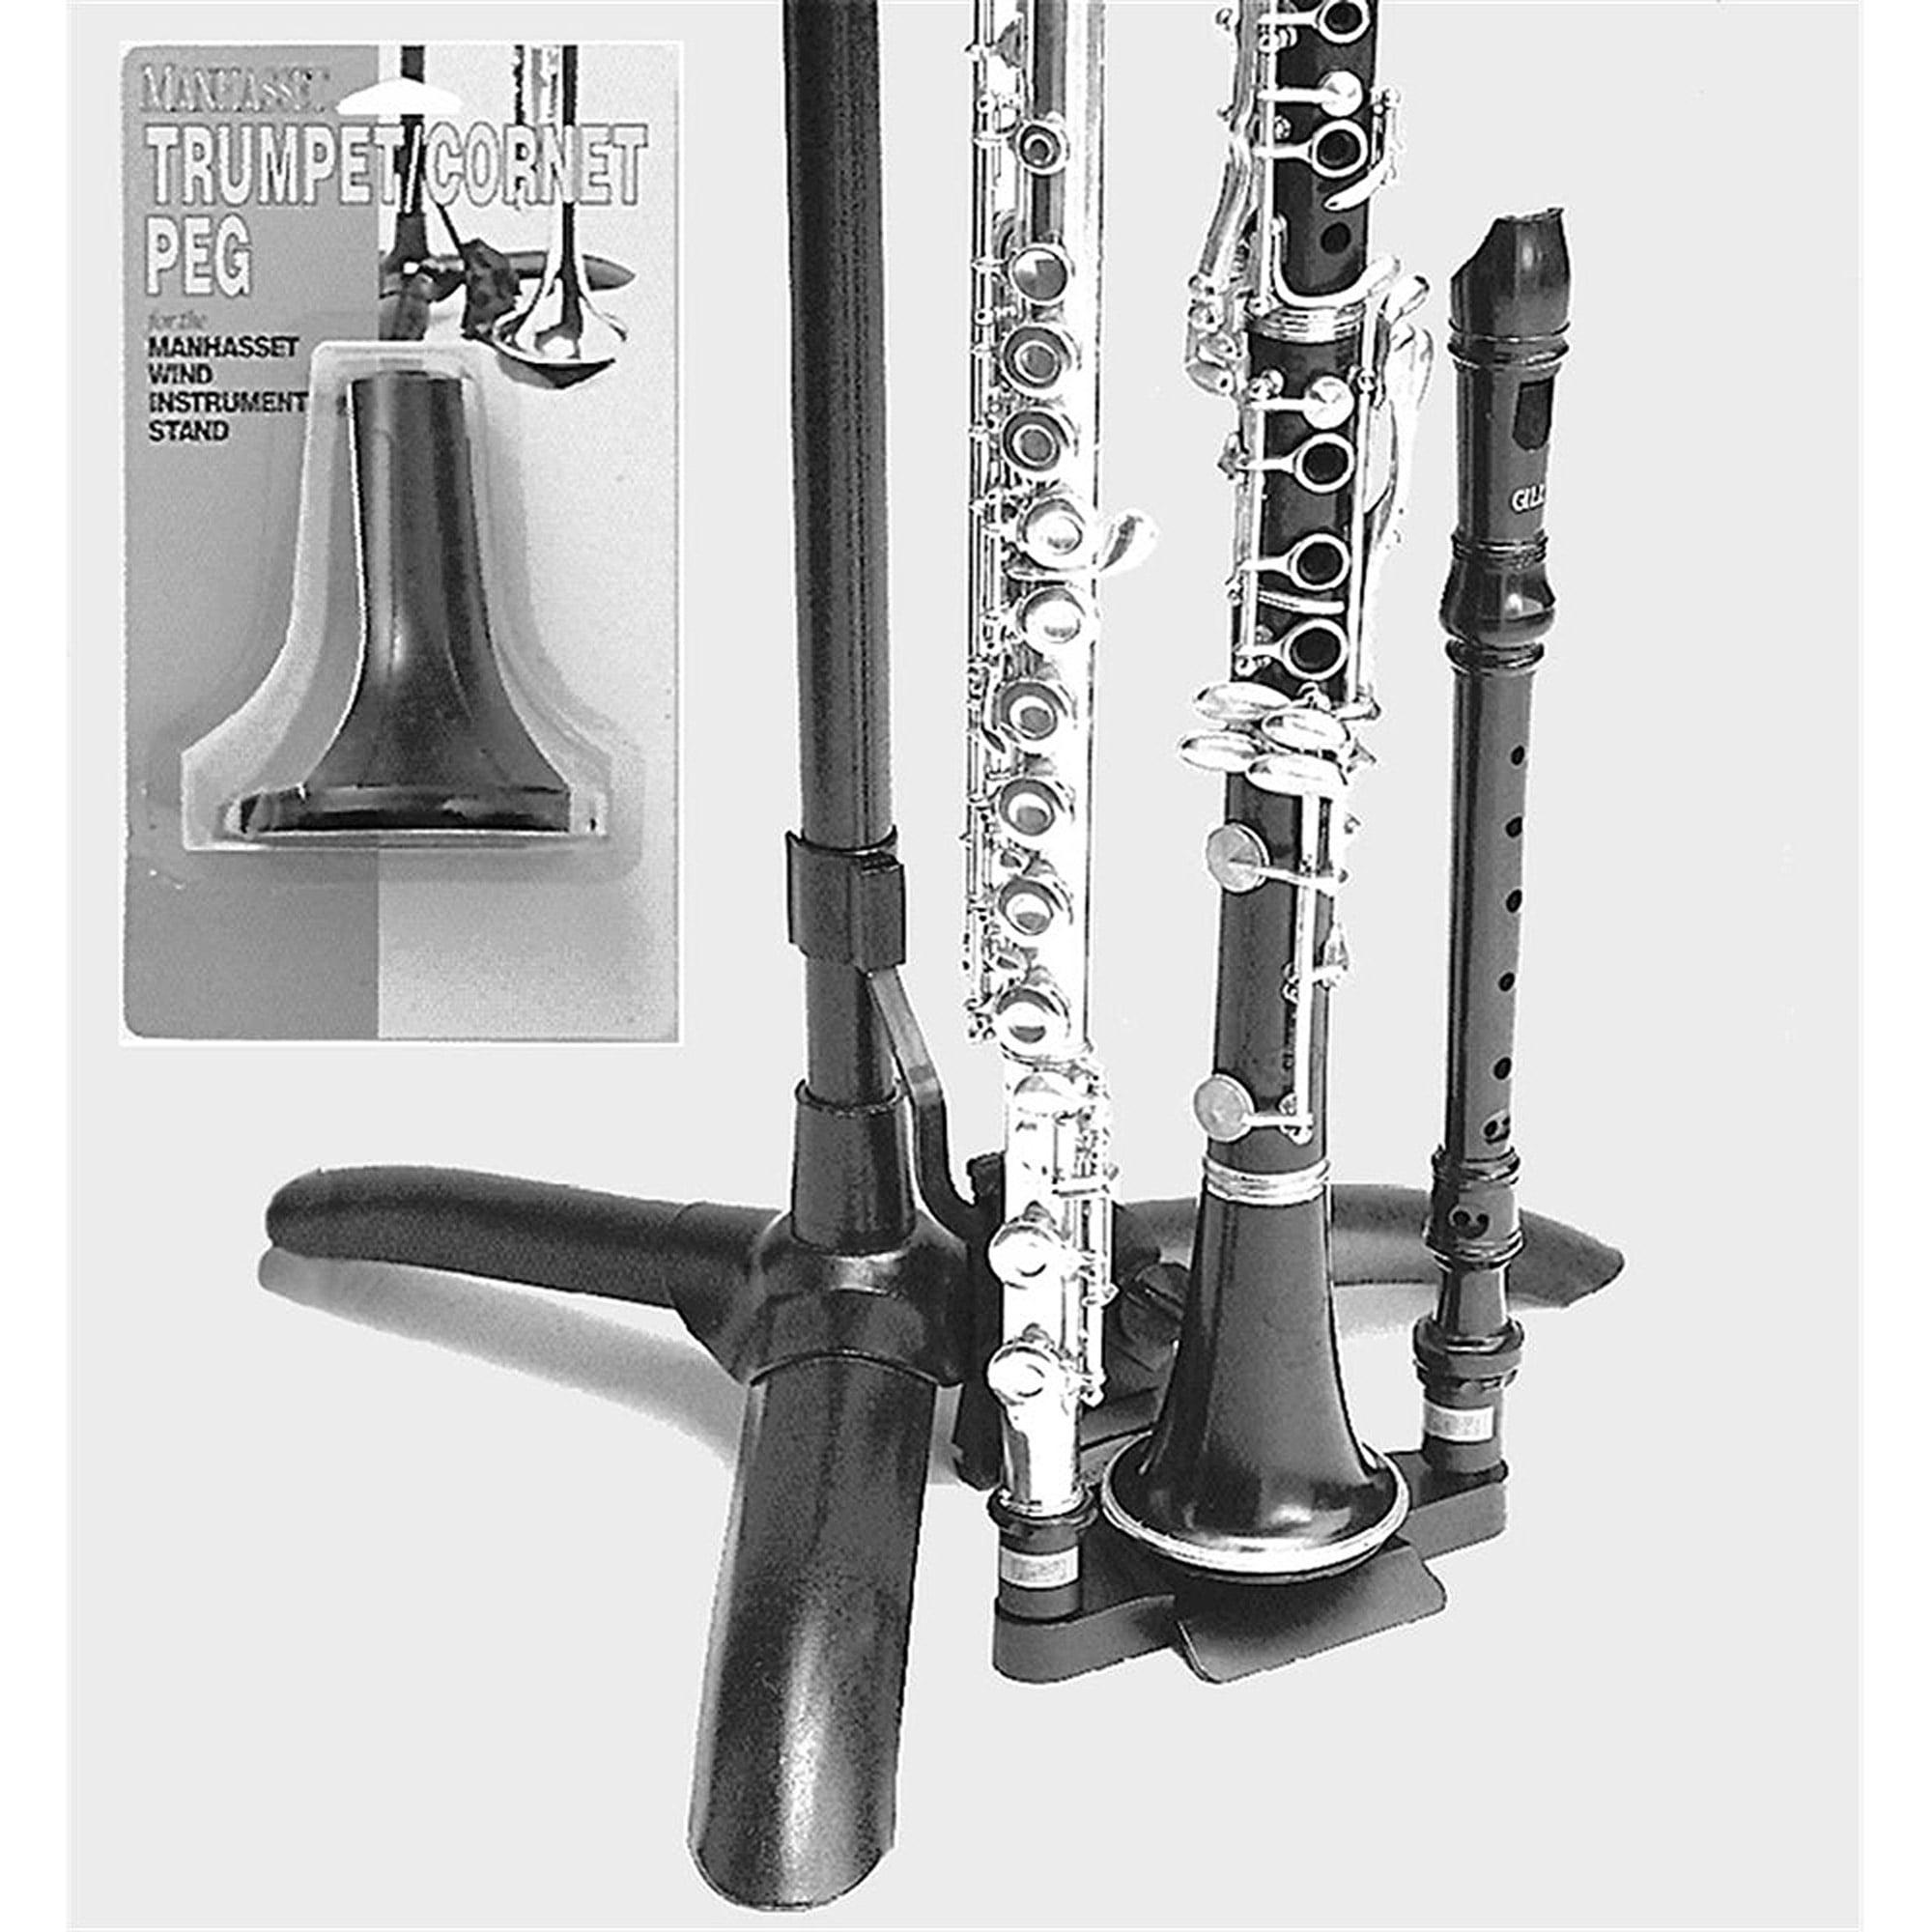 Manhasset #1480 Trumpet Cornet Peg, Music Stand Accessory by Manhasset